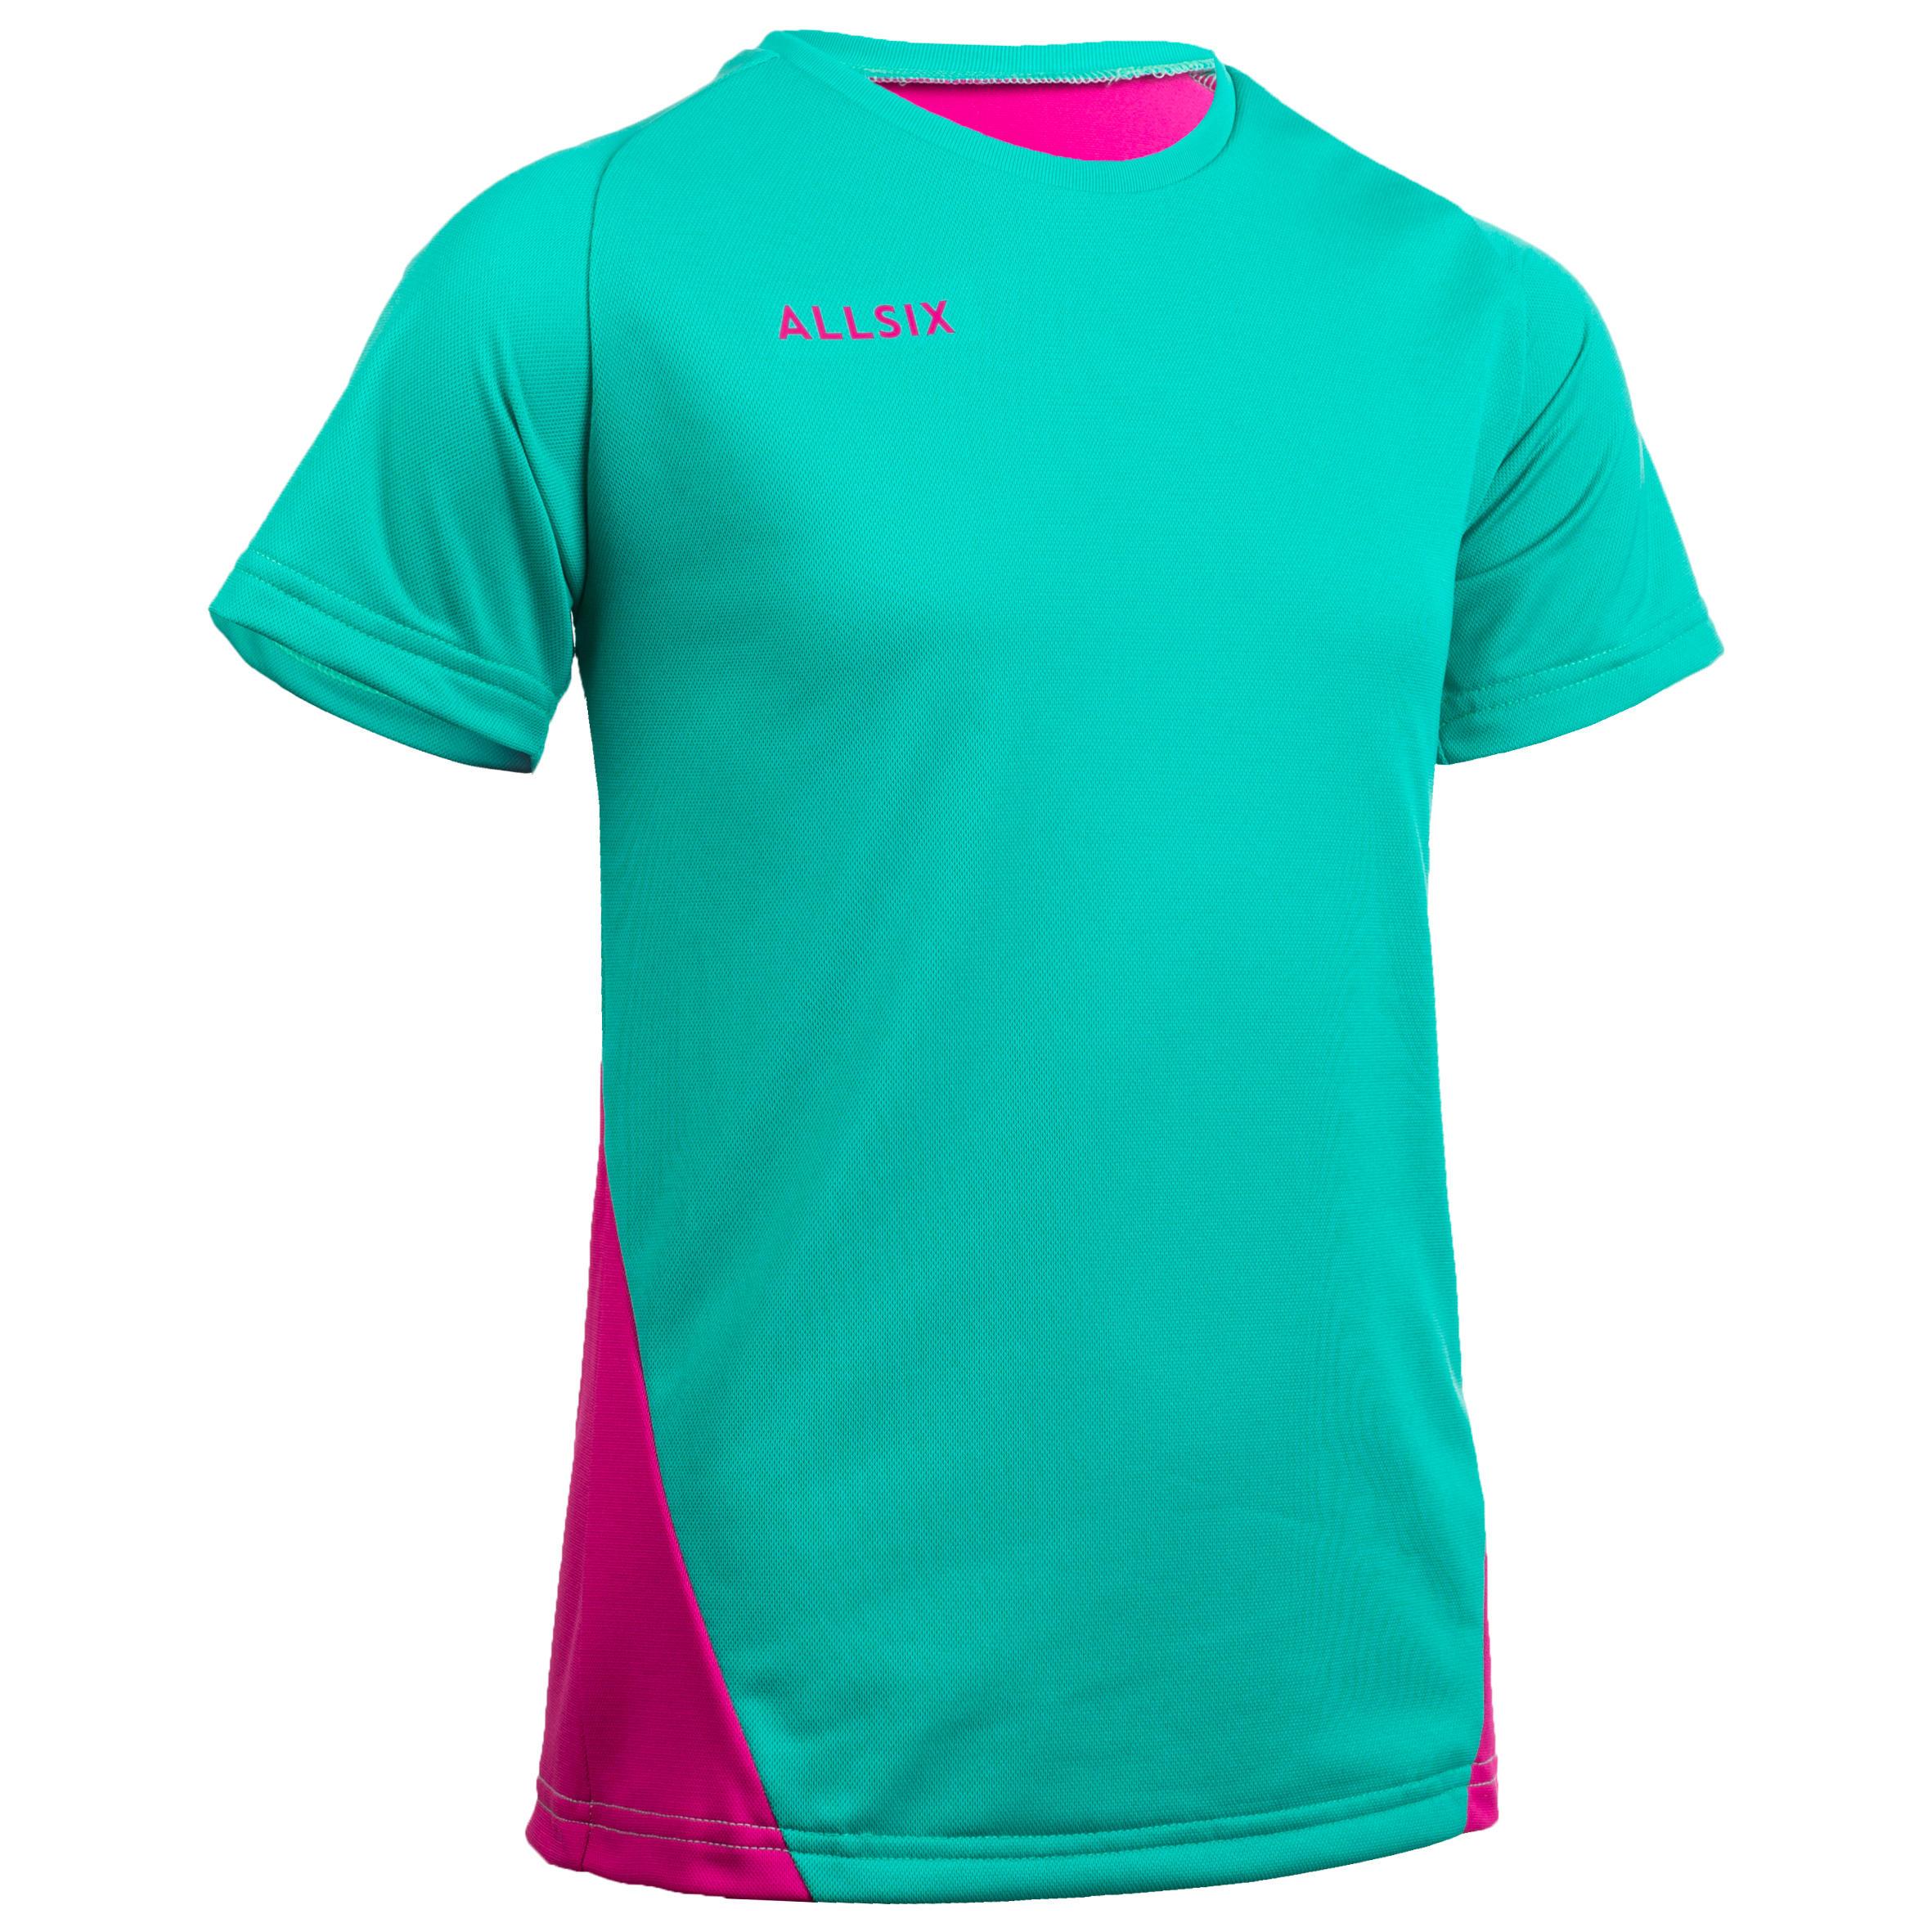 Maillot de volley ball fille v100 vert et rose allsix